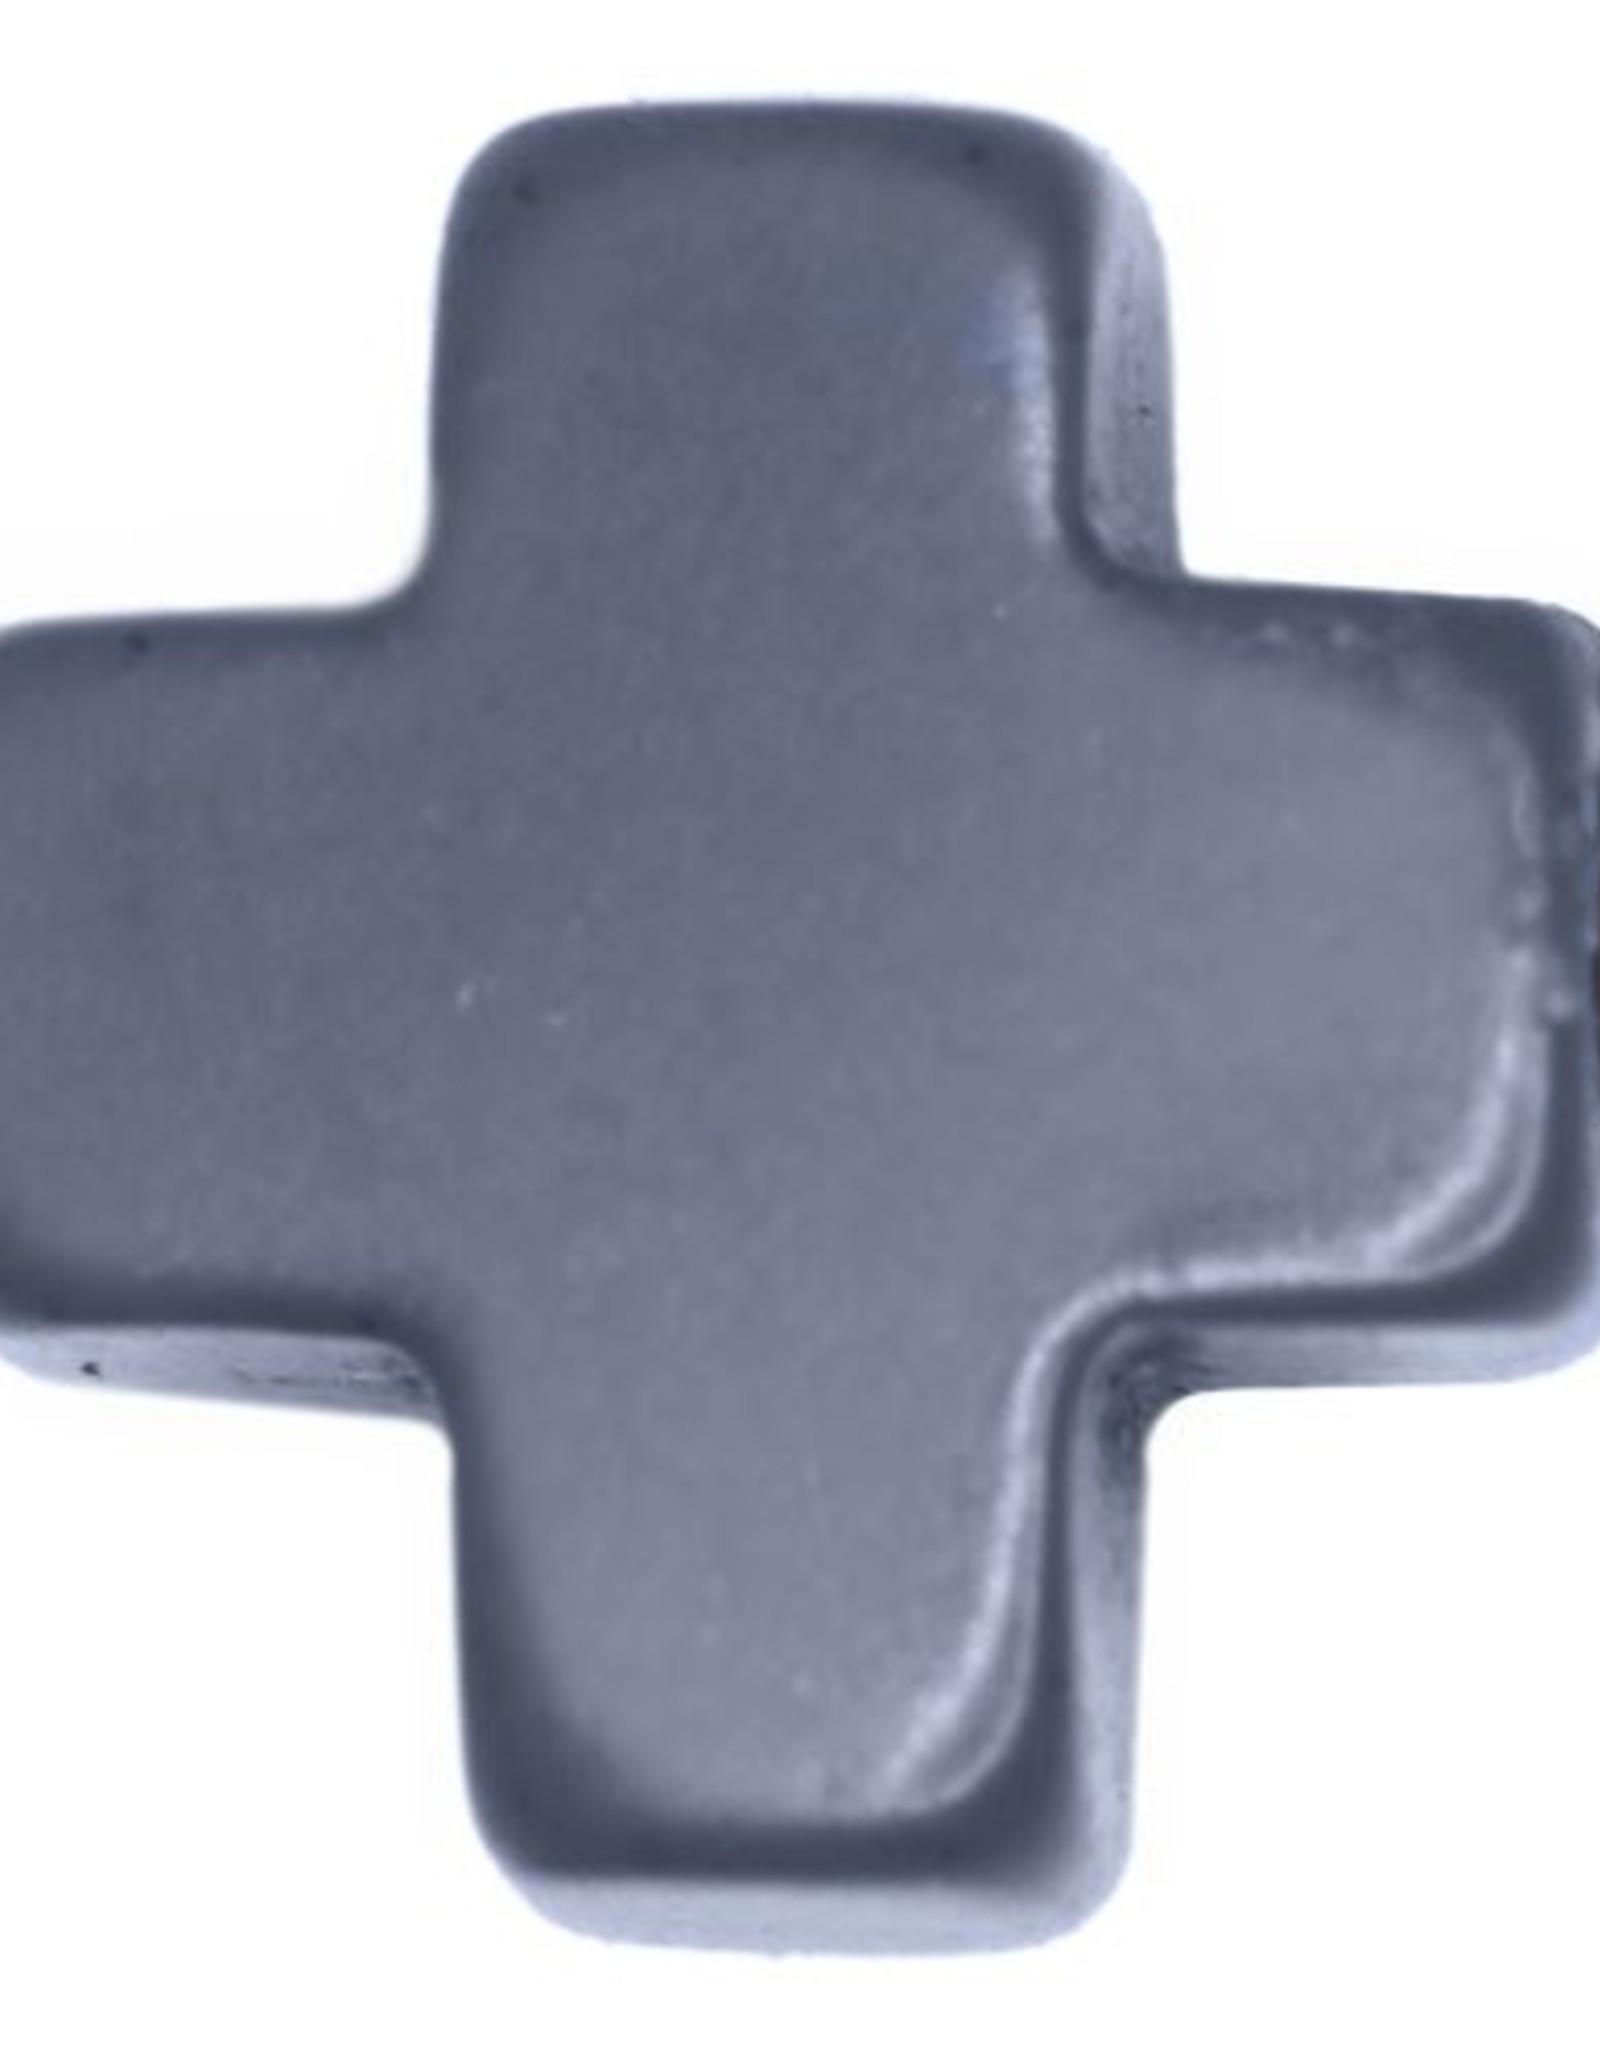 ENewton Design ENewton Designs- Signature Cross Stud Earring